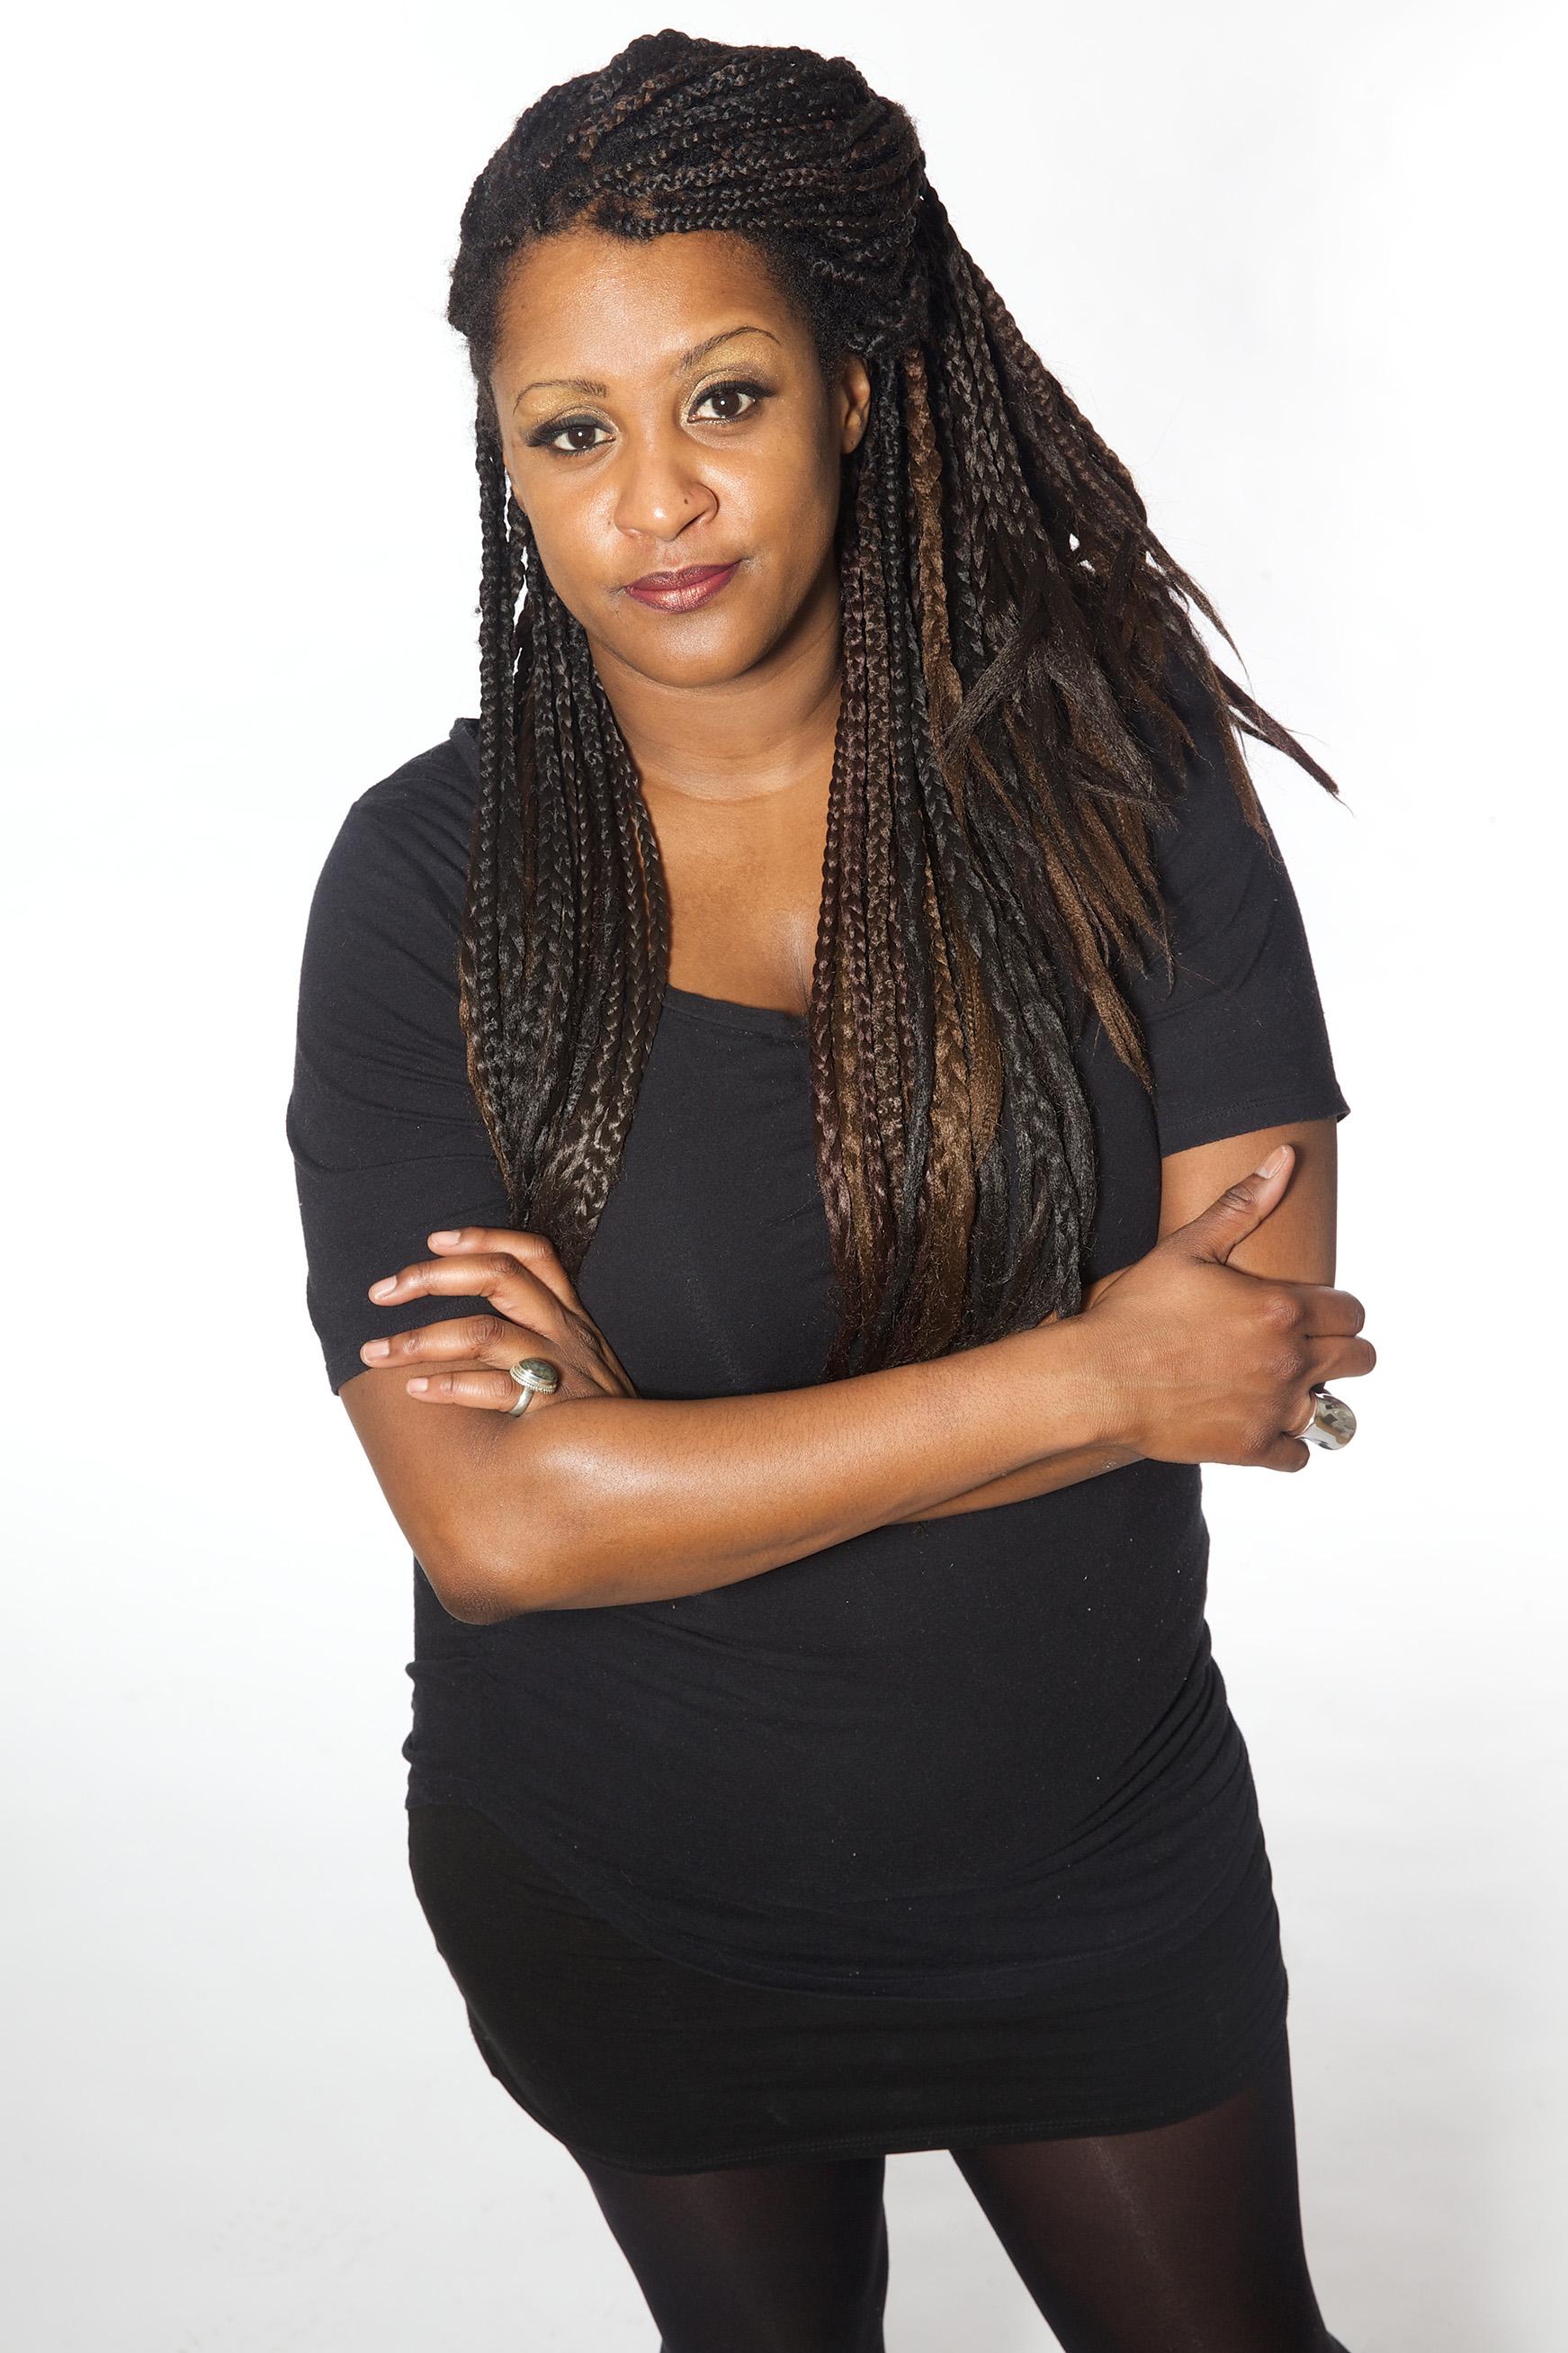 Dana Alexander Stand Up Comedian